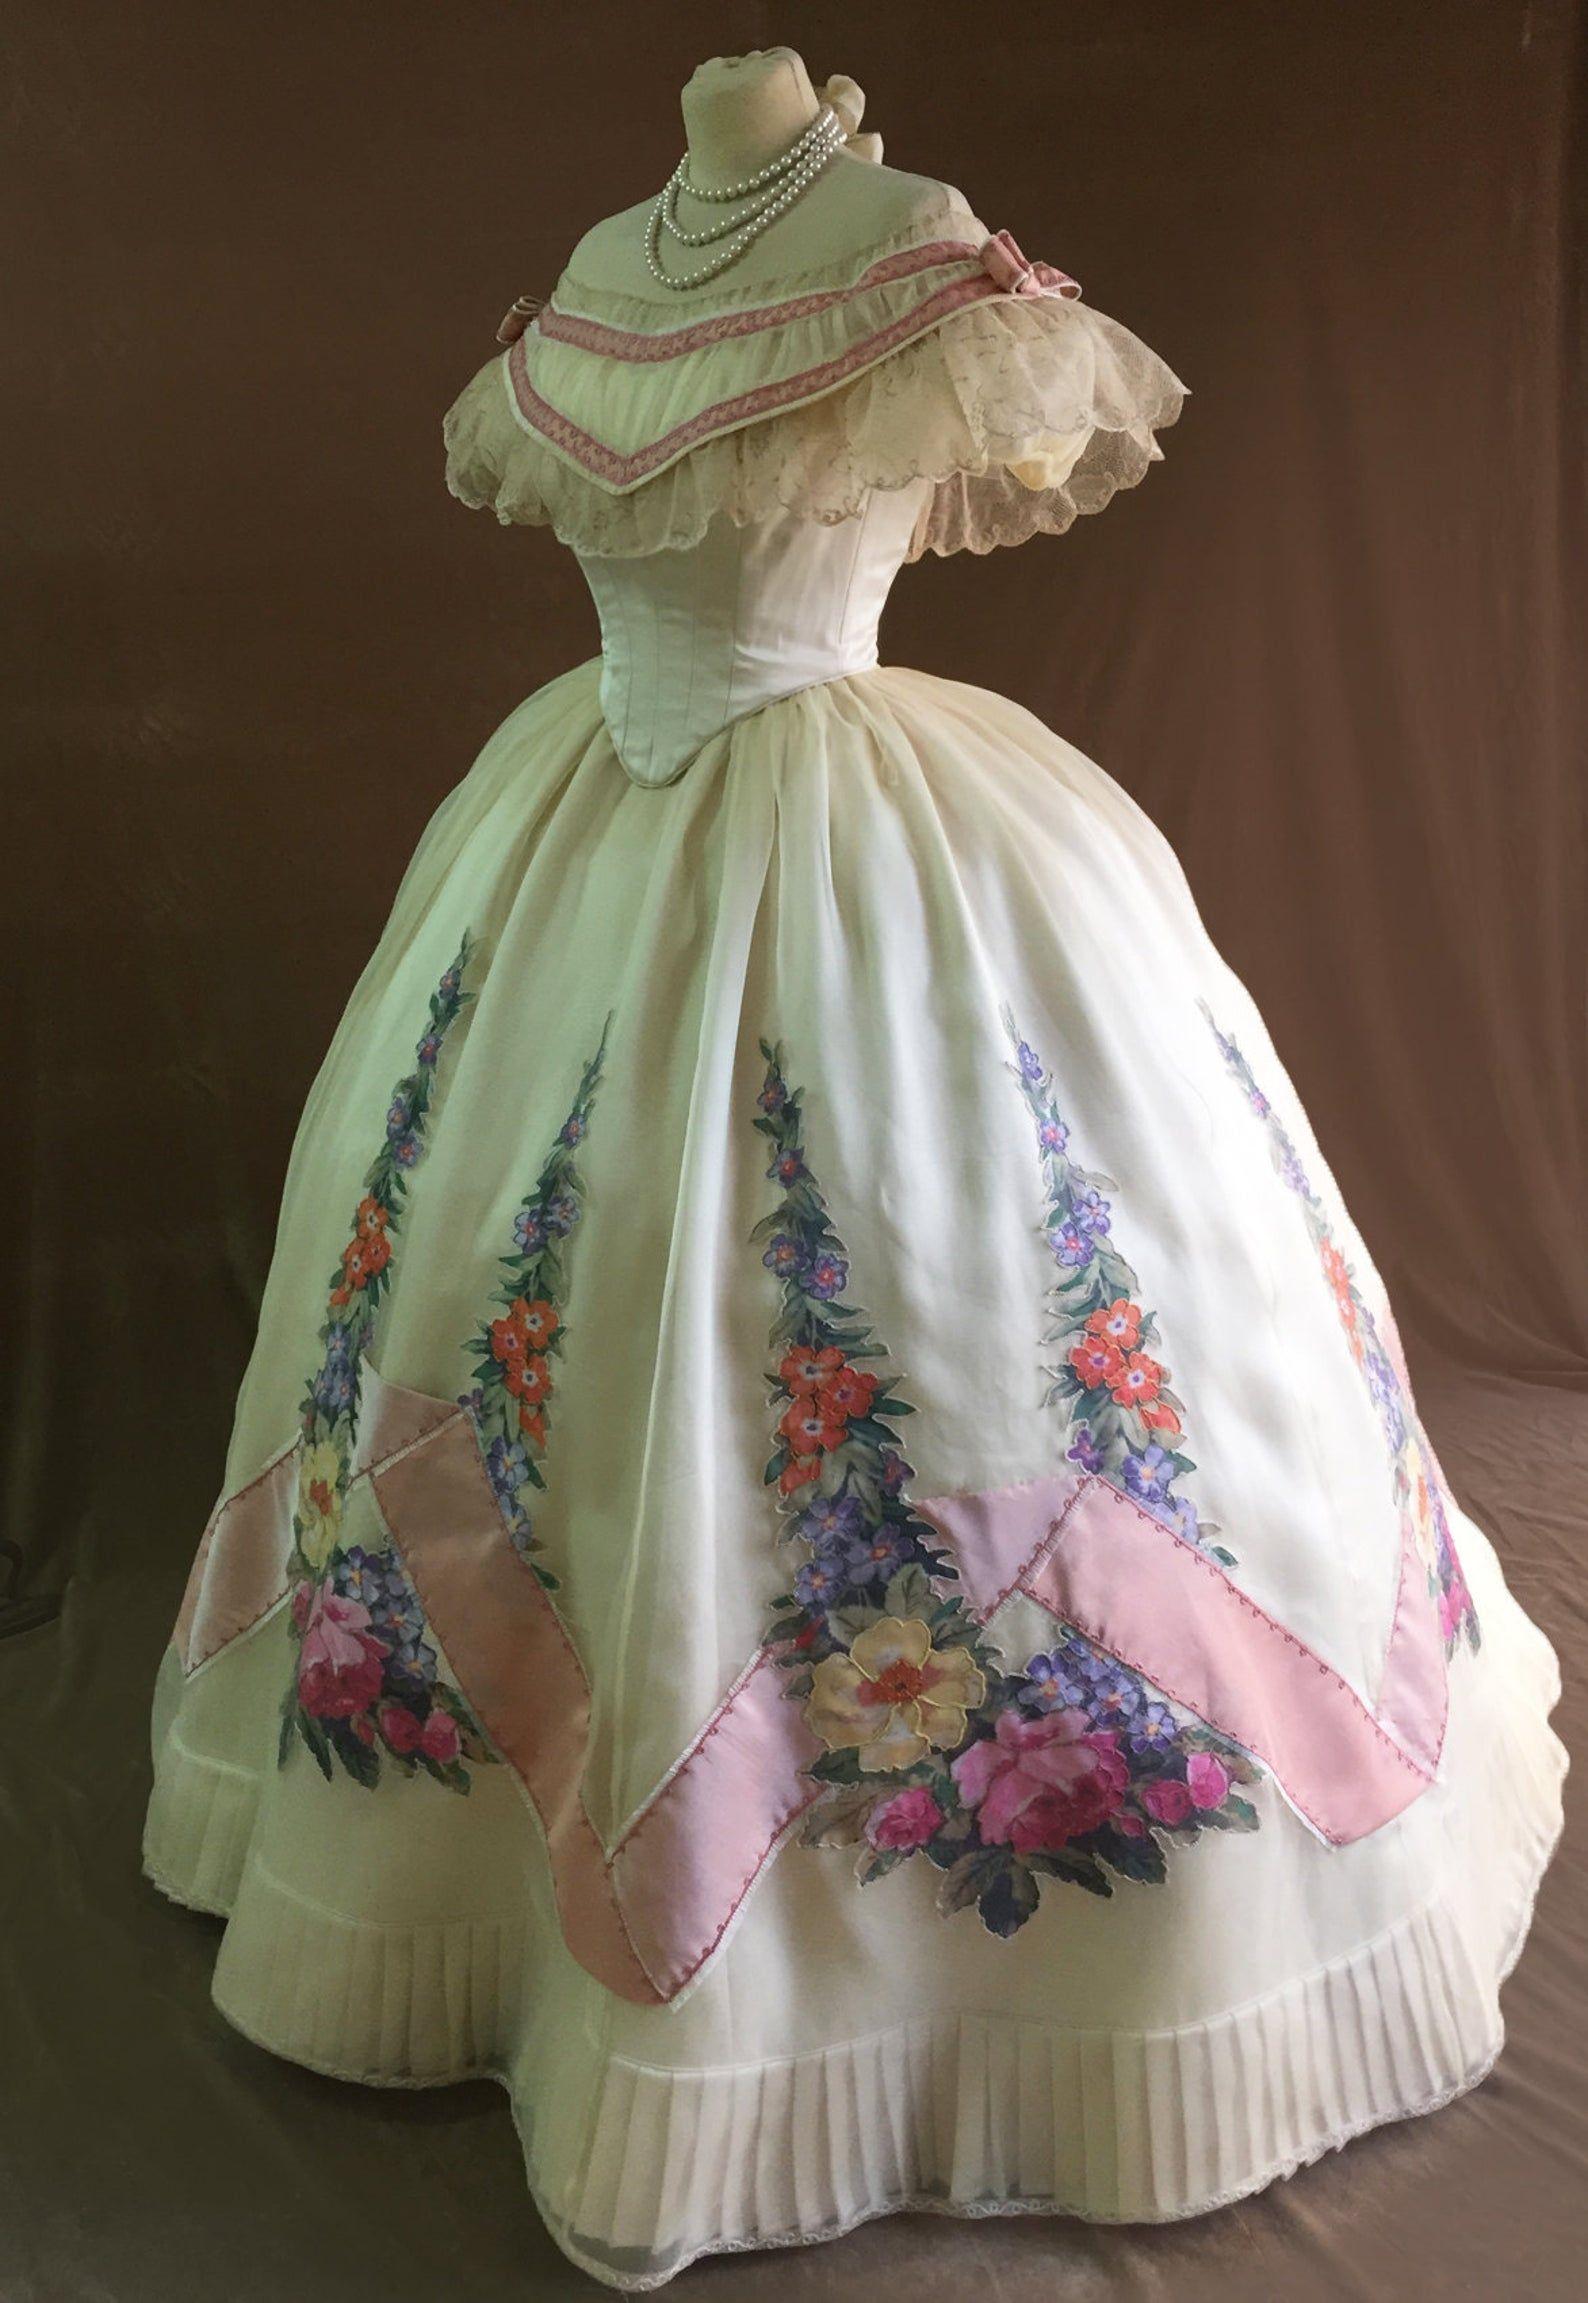 1860s Ballgown Victorian Dress Etsy Victorian Dress Victorian Clothing 1860s Ballgown [ 2303 x 1588 Pixel ]